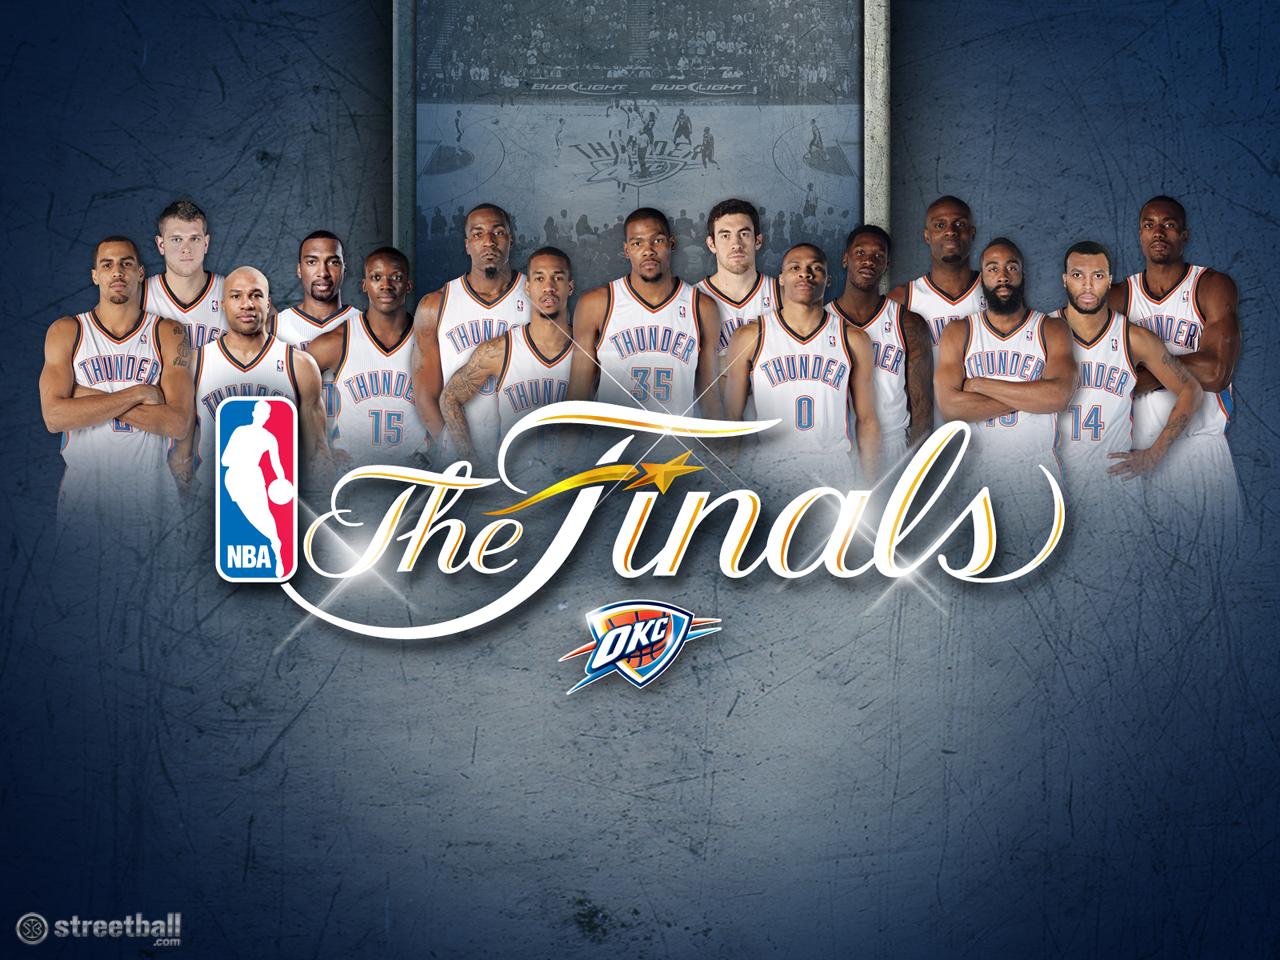 http://1.bp.blogspot.com/-w7LDdwpNn9s/T959eOqukgI/AAAAAAAADEM/pqlE3MkqOMQ/s1600/Oklahoma_City_Thunder_NBA_Finals_Team_Wallpaper_2012.png